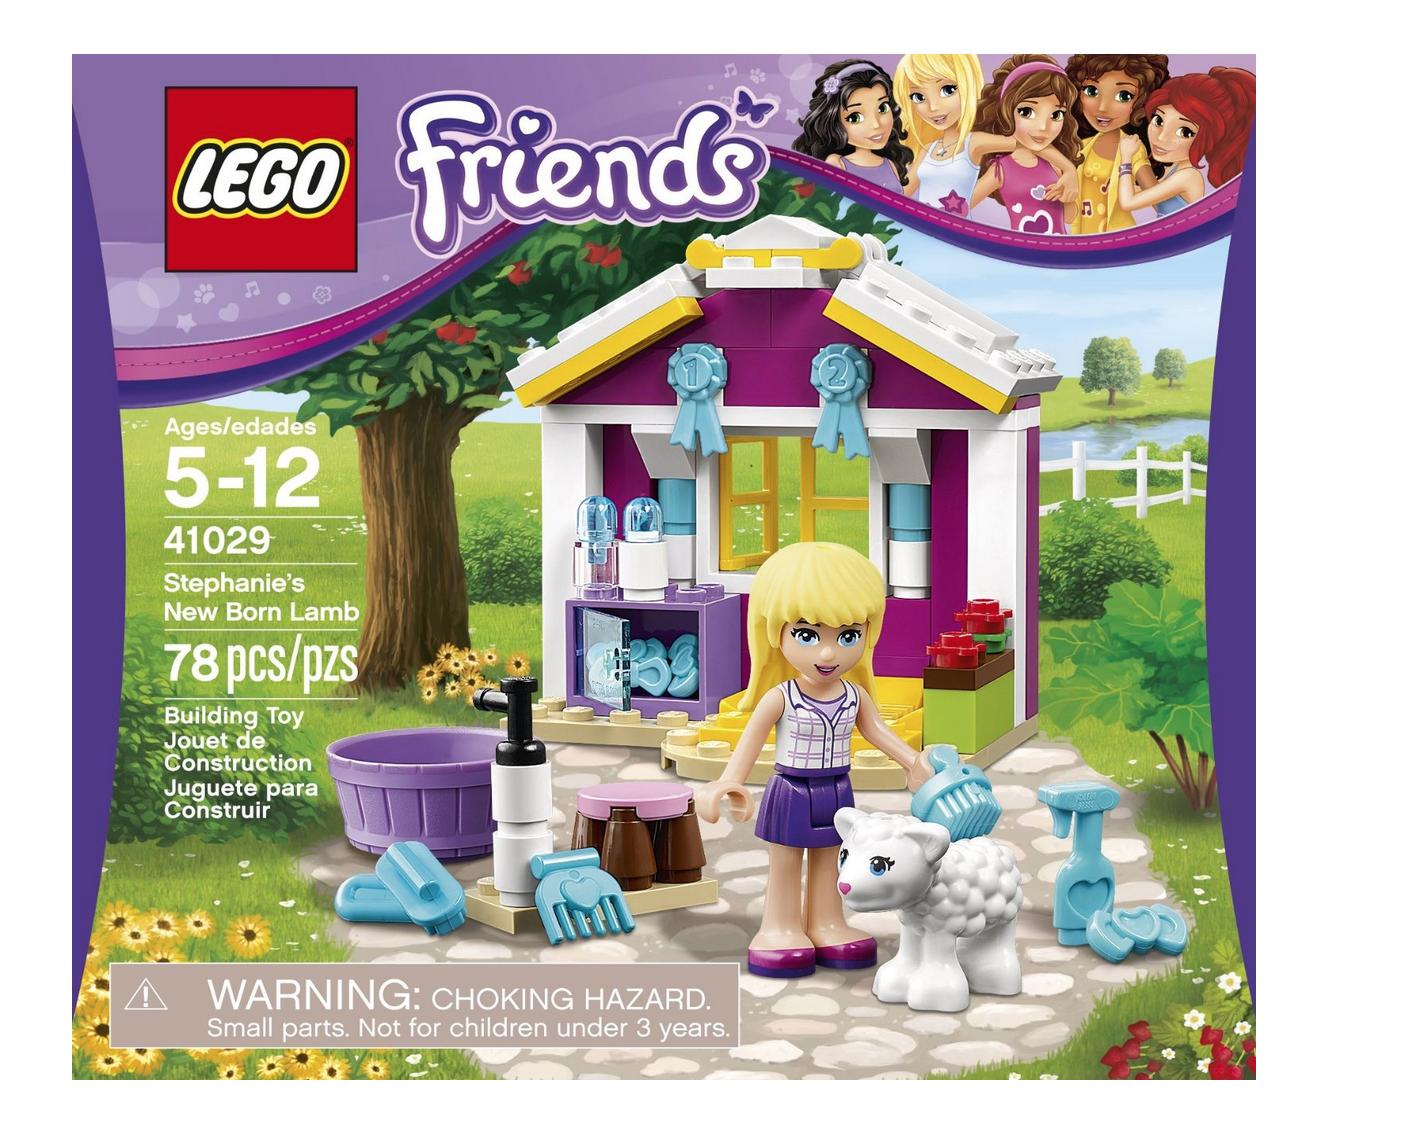 LEGO Friends Stephanie's New Born Lamb Only $7.98 (Reg. $11.99!)